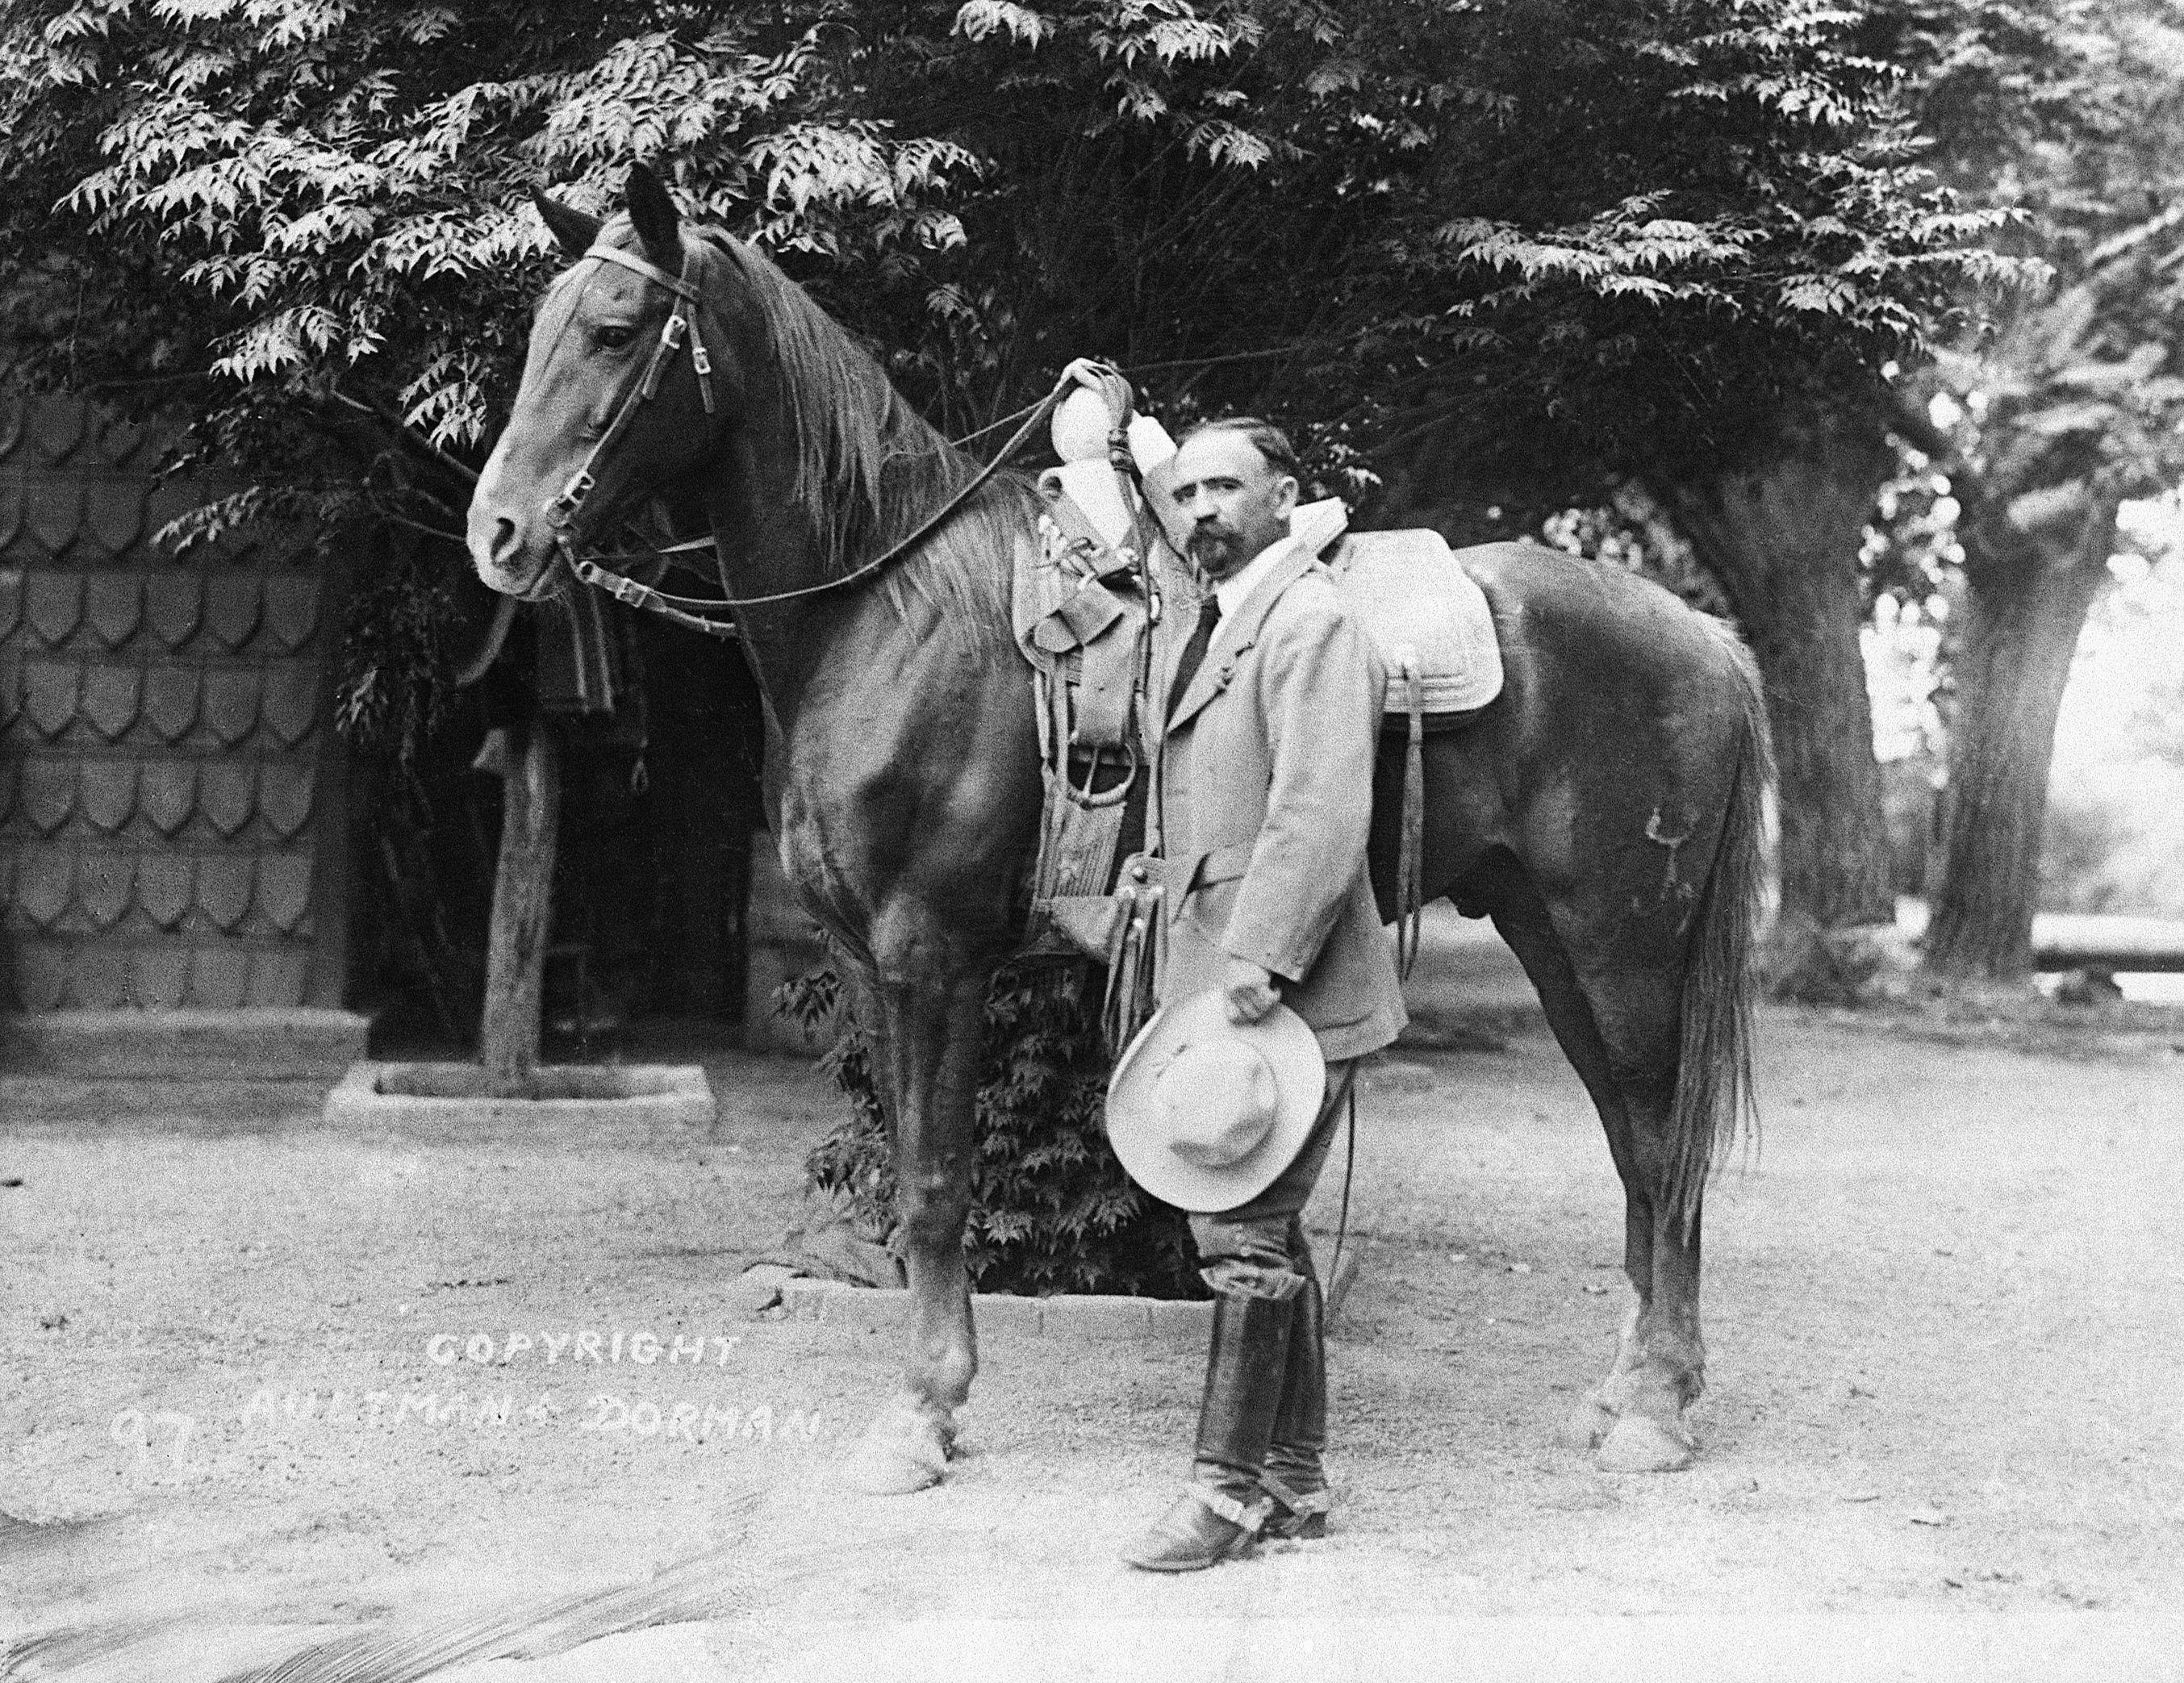 Francisco Madero Ποζάροντας με άλογο